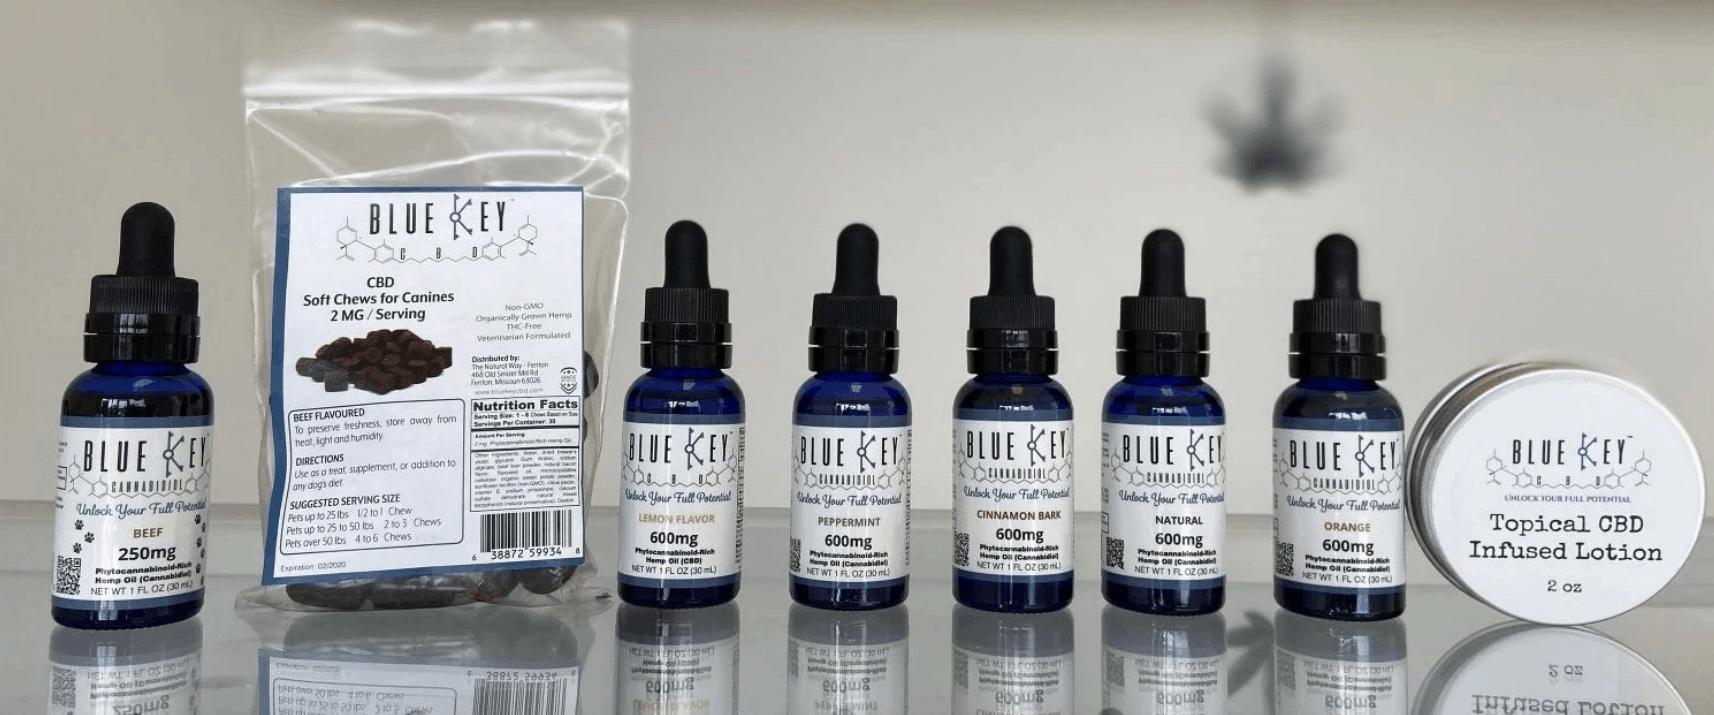 Blue Key CBD Coupons Our Product Range